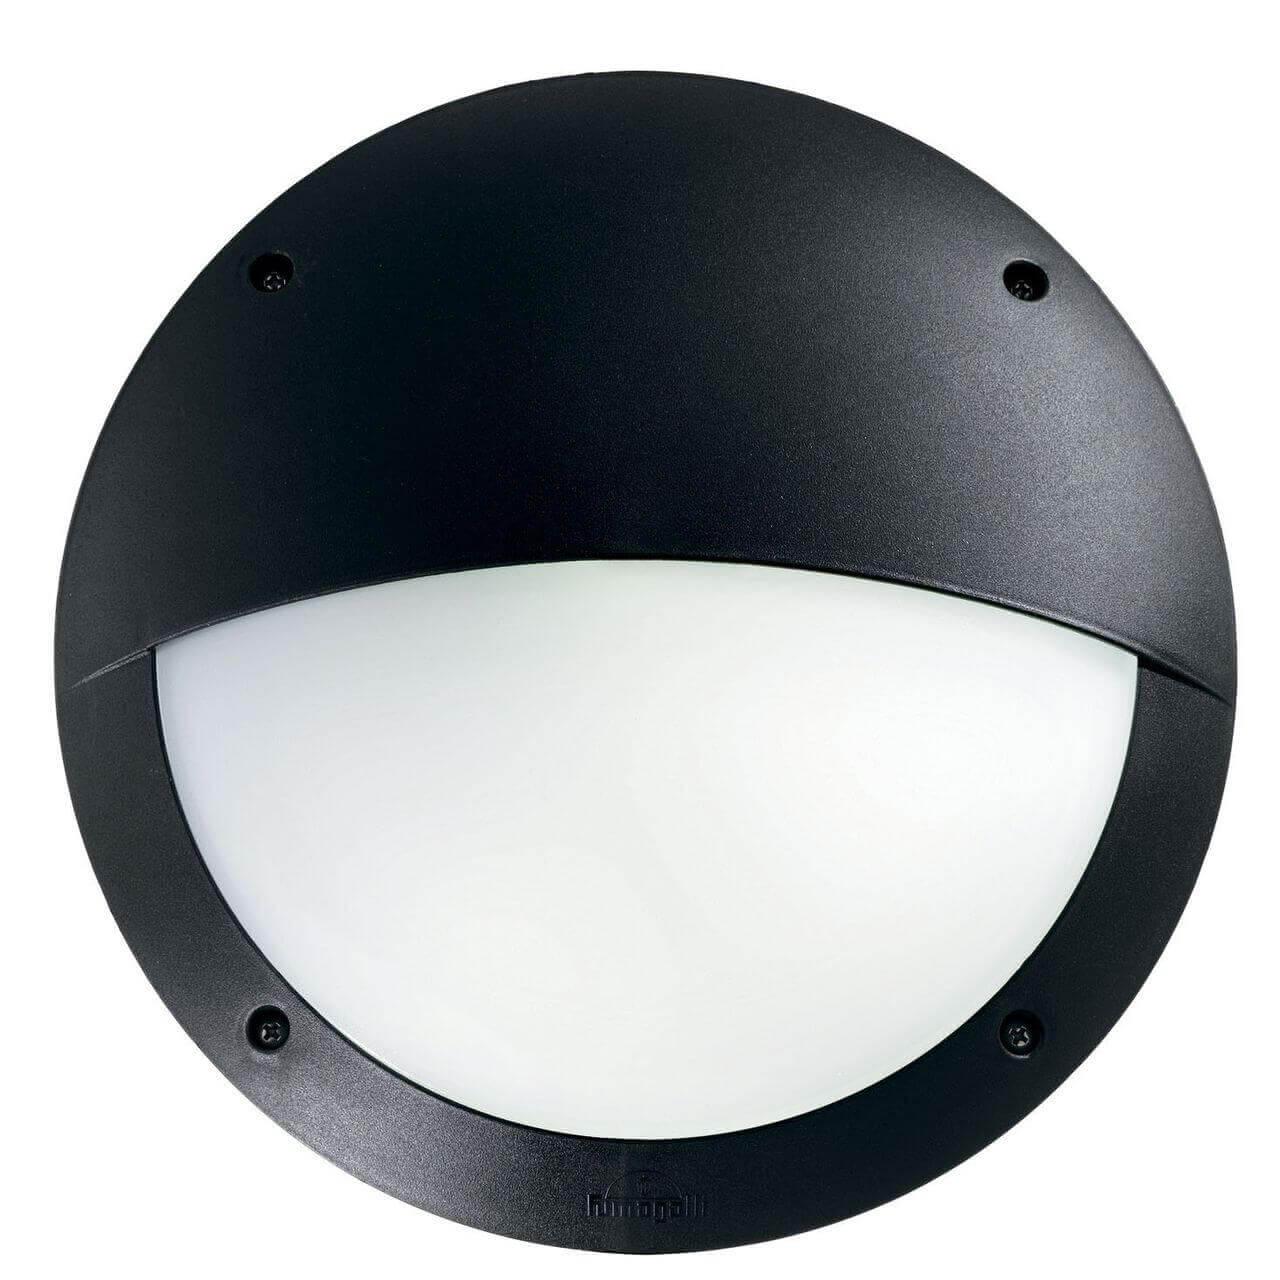 Светильник Ideal Lux Lucia-2 AP1 Nero Lucia Nero